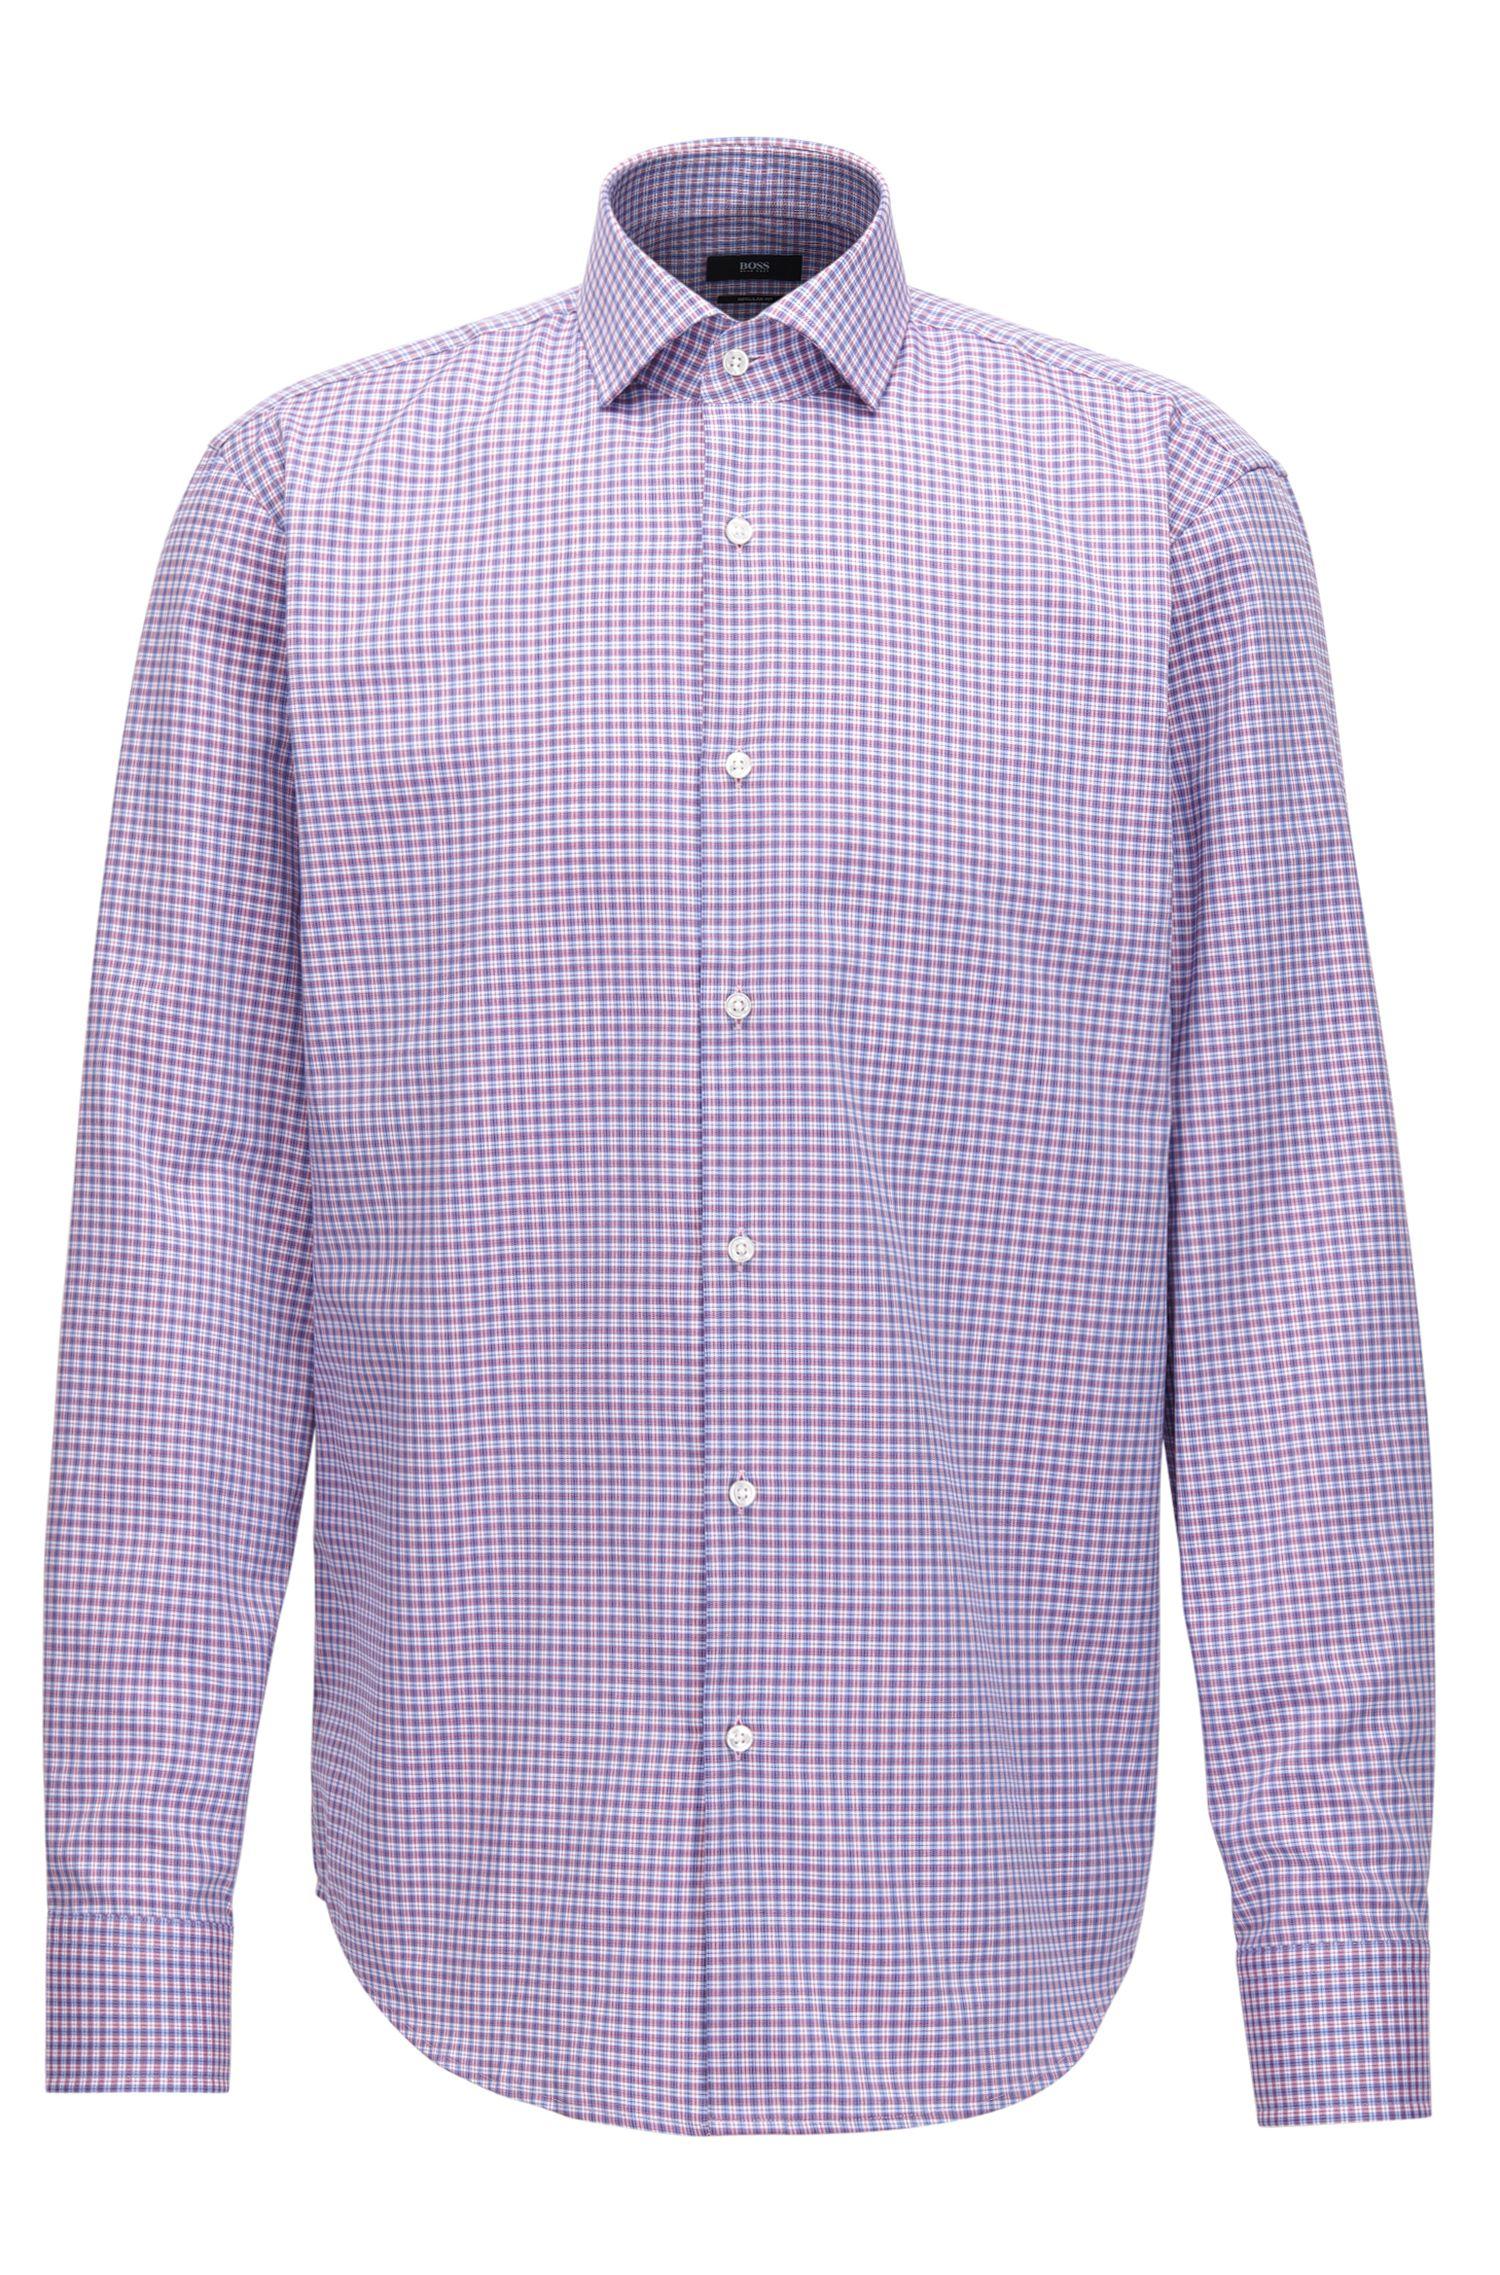 Plaid Cotton Dress Shirt, Regular Fit | Gordon